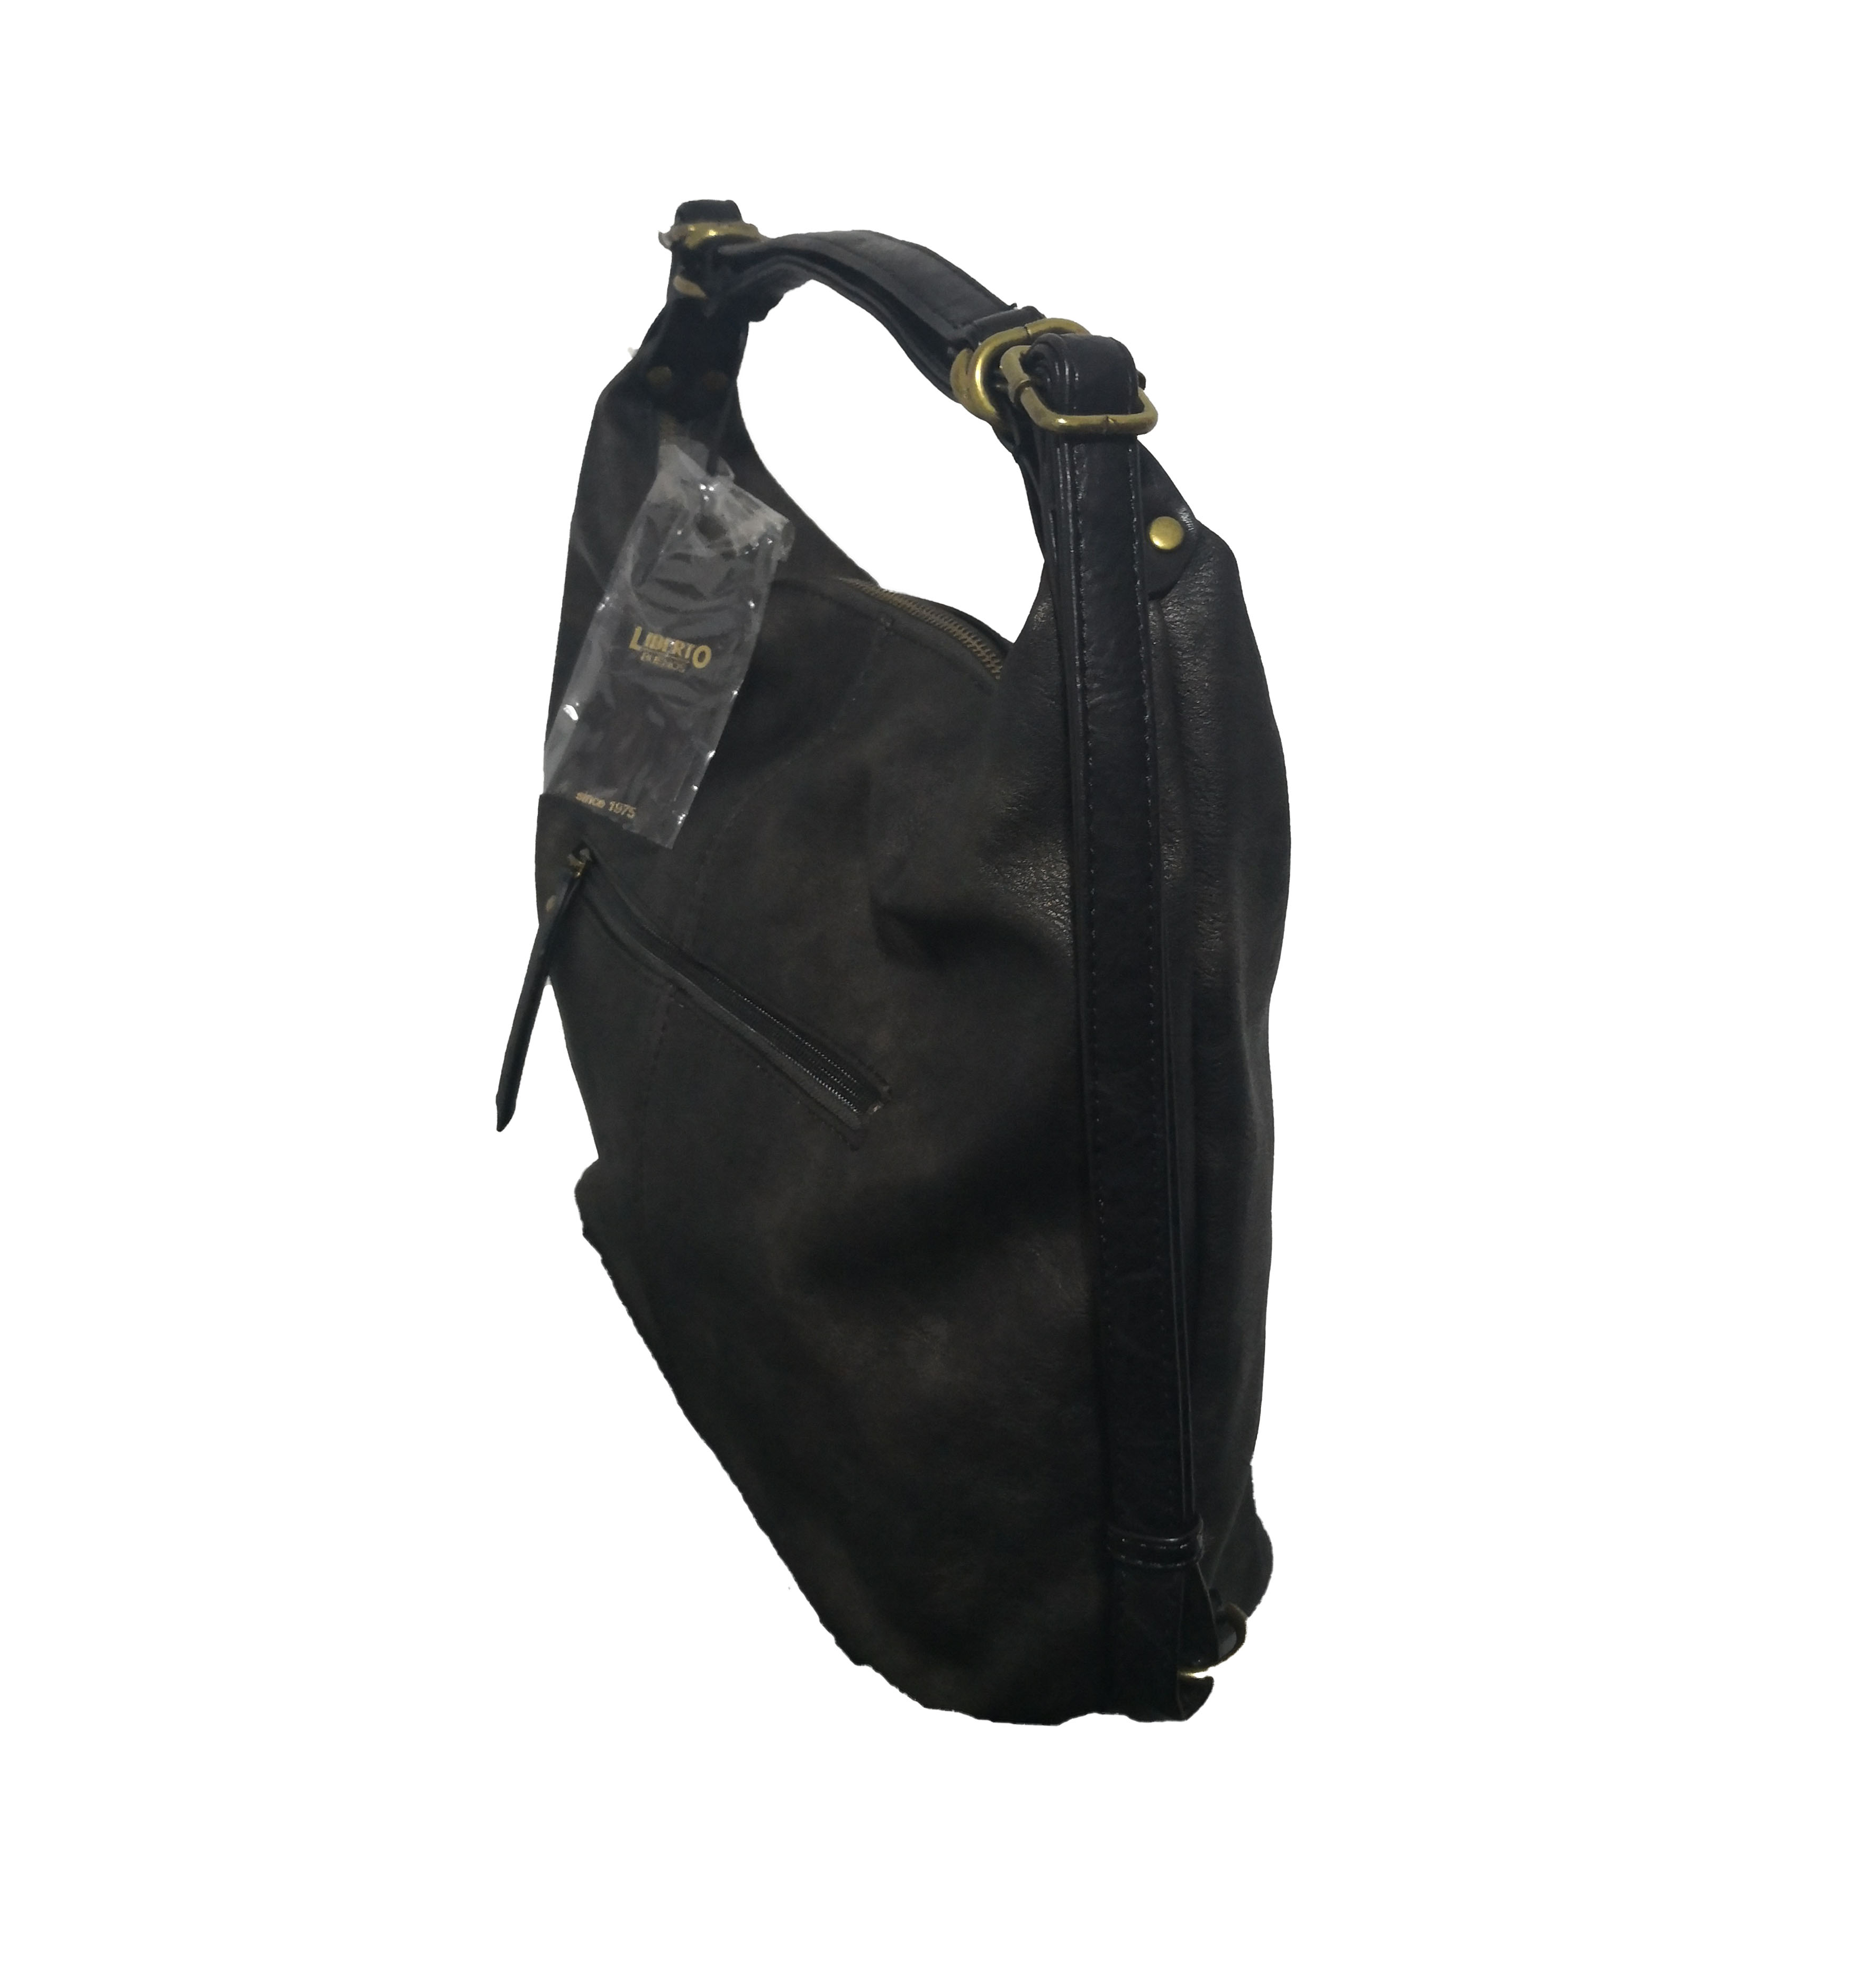 de Bolso Liberto Bolsos mochila Bolsos Peyo negro Tienda Online wIIpBqnC